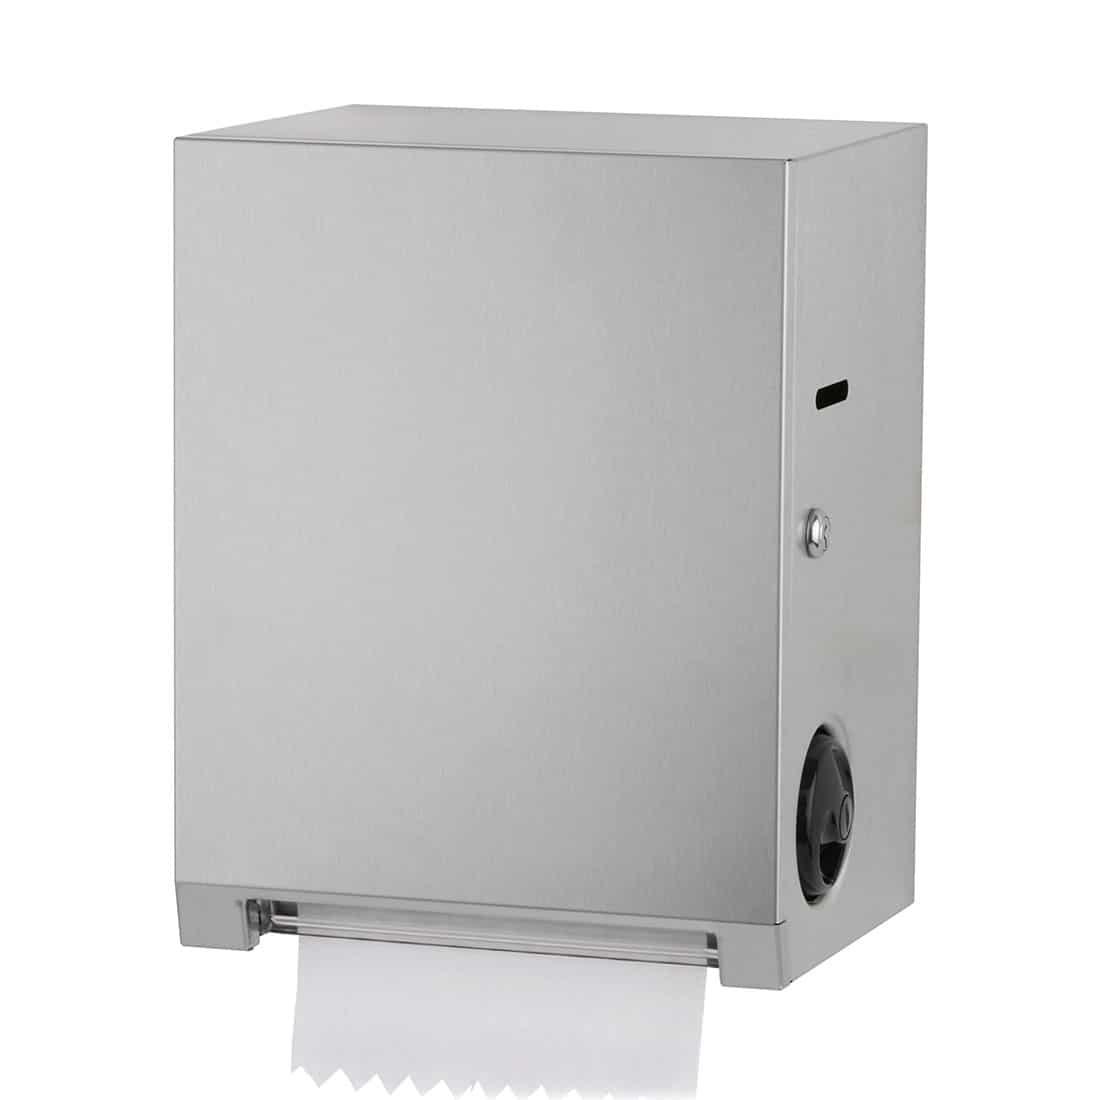 Bobrick Surface Mount Roll Towel Dispenser B 2860